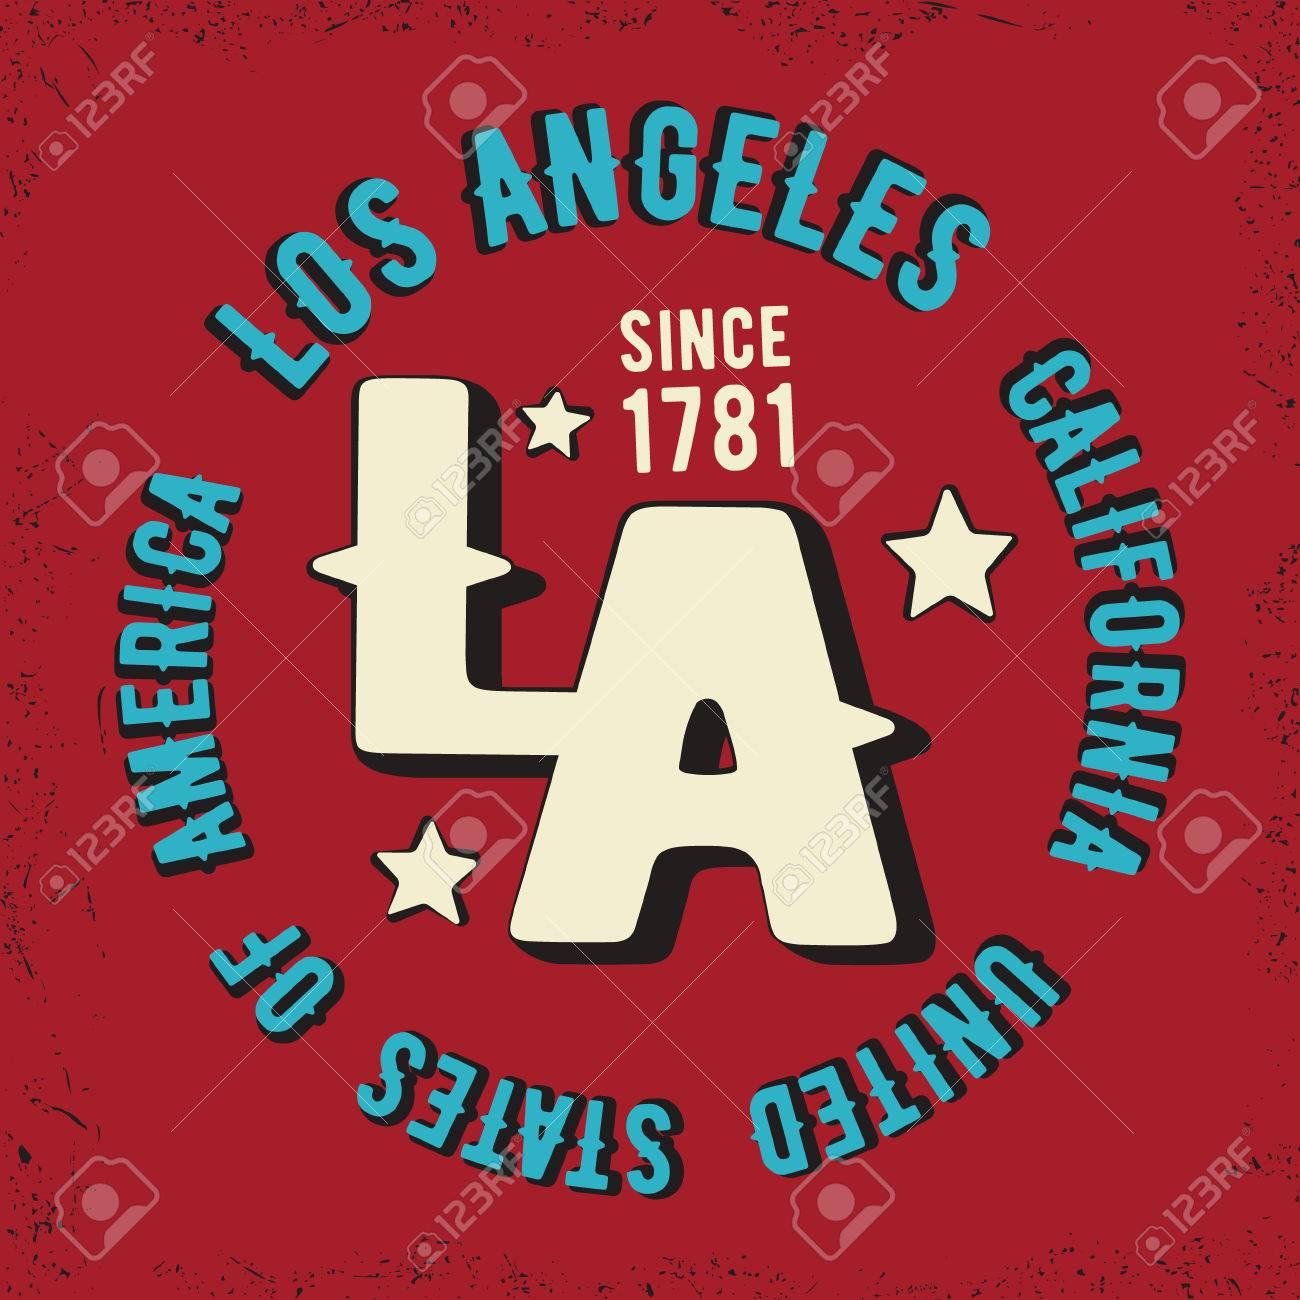 Shirt design los angeles - T Shirt Print Design Los Angeles Vintage Stamp Printing And Badge Applique